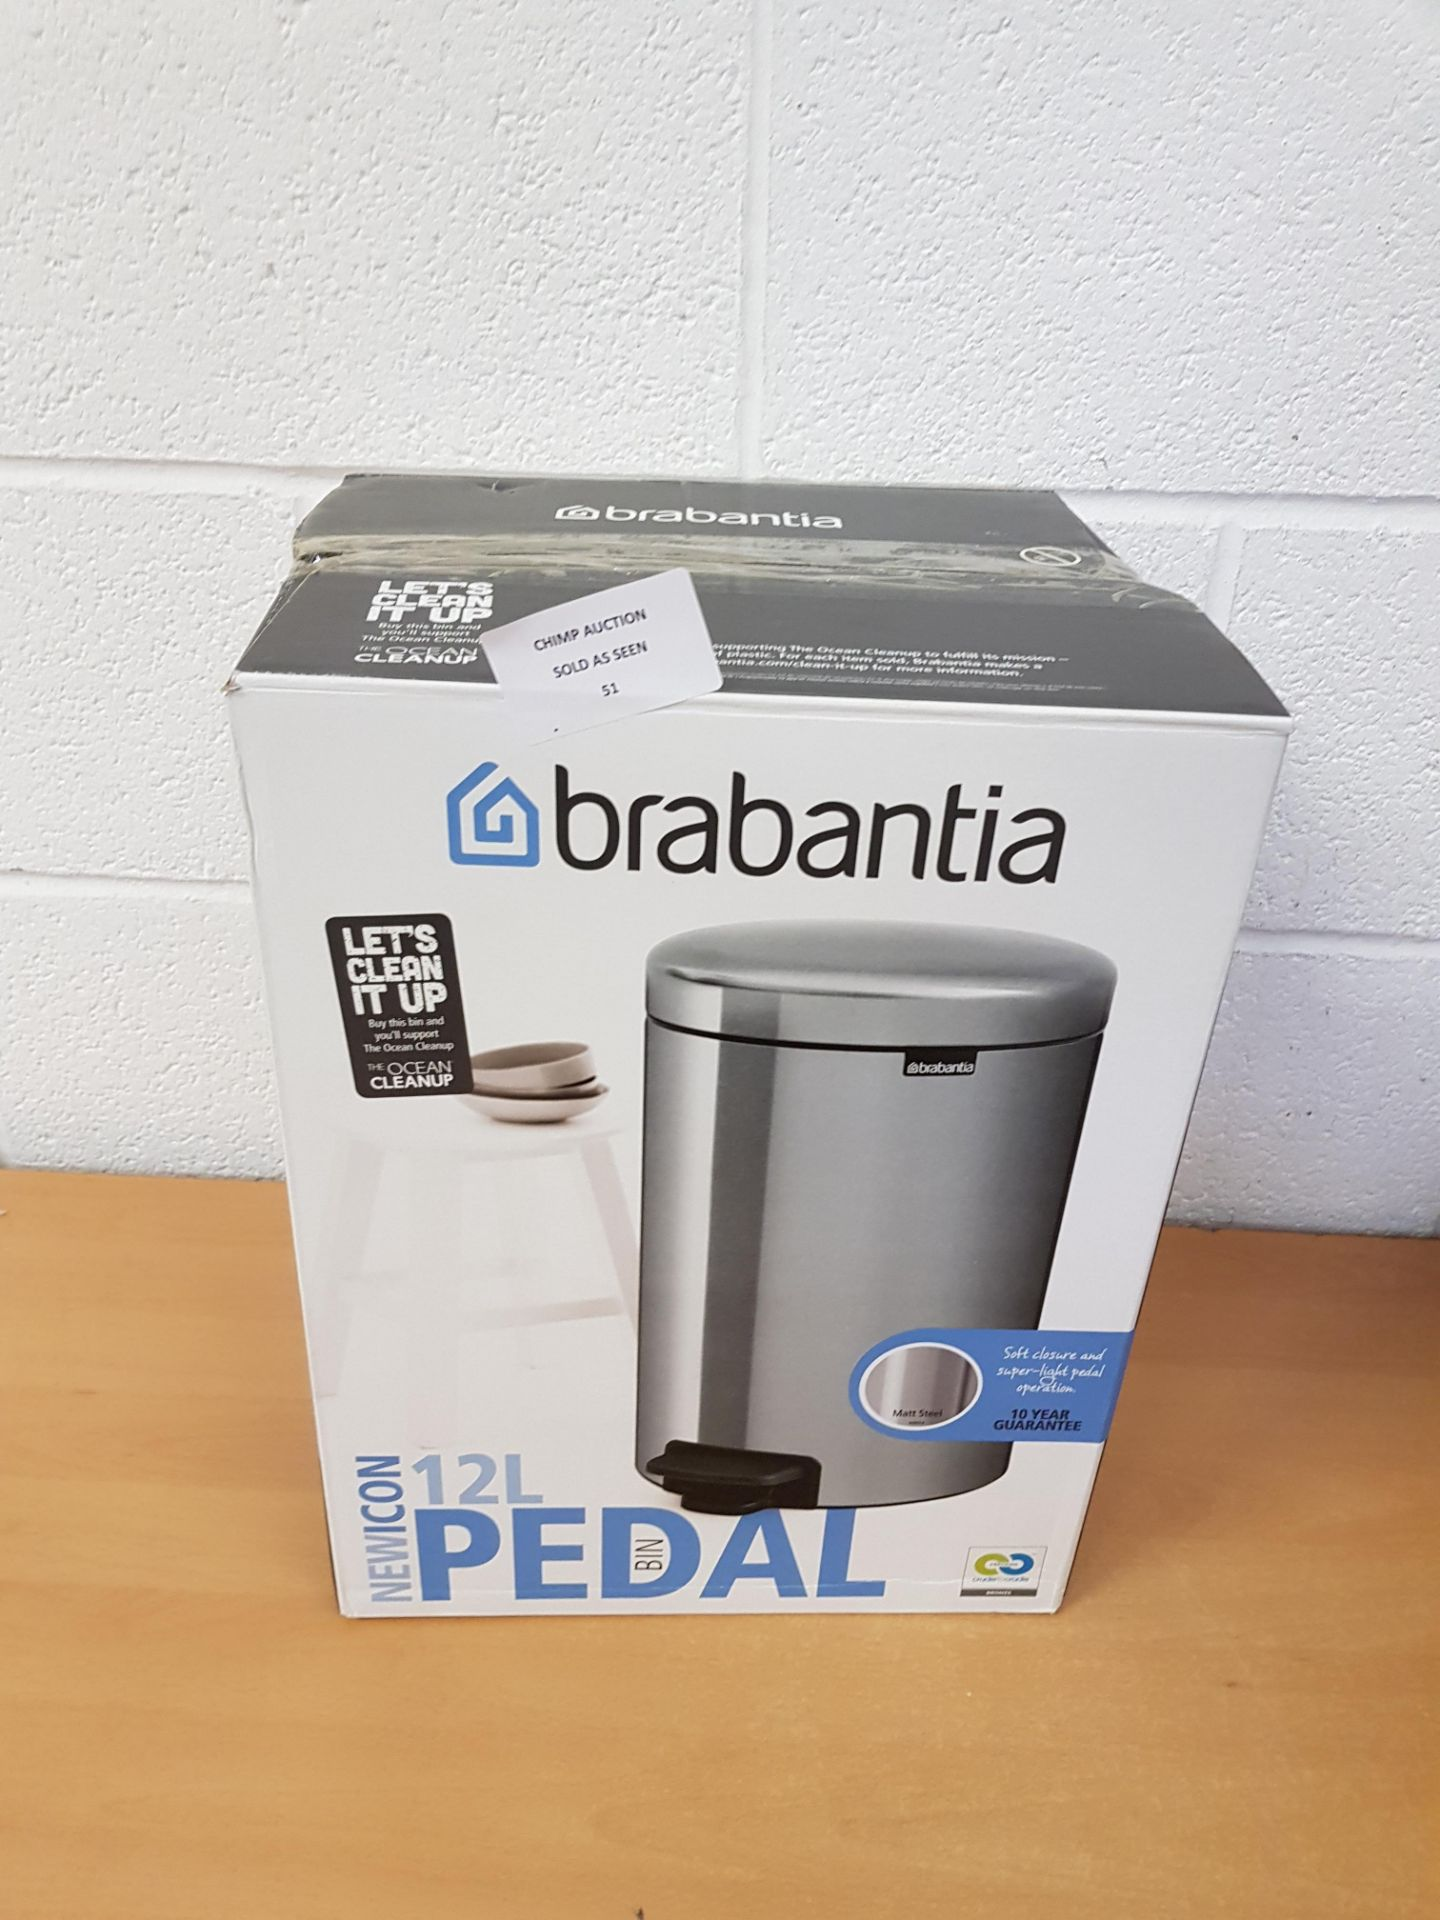 Lot 51 - Brabantia 12L Pedal Bin